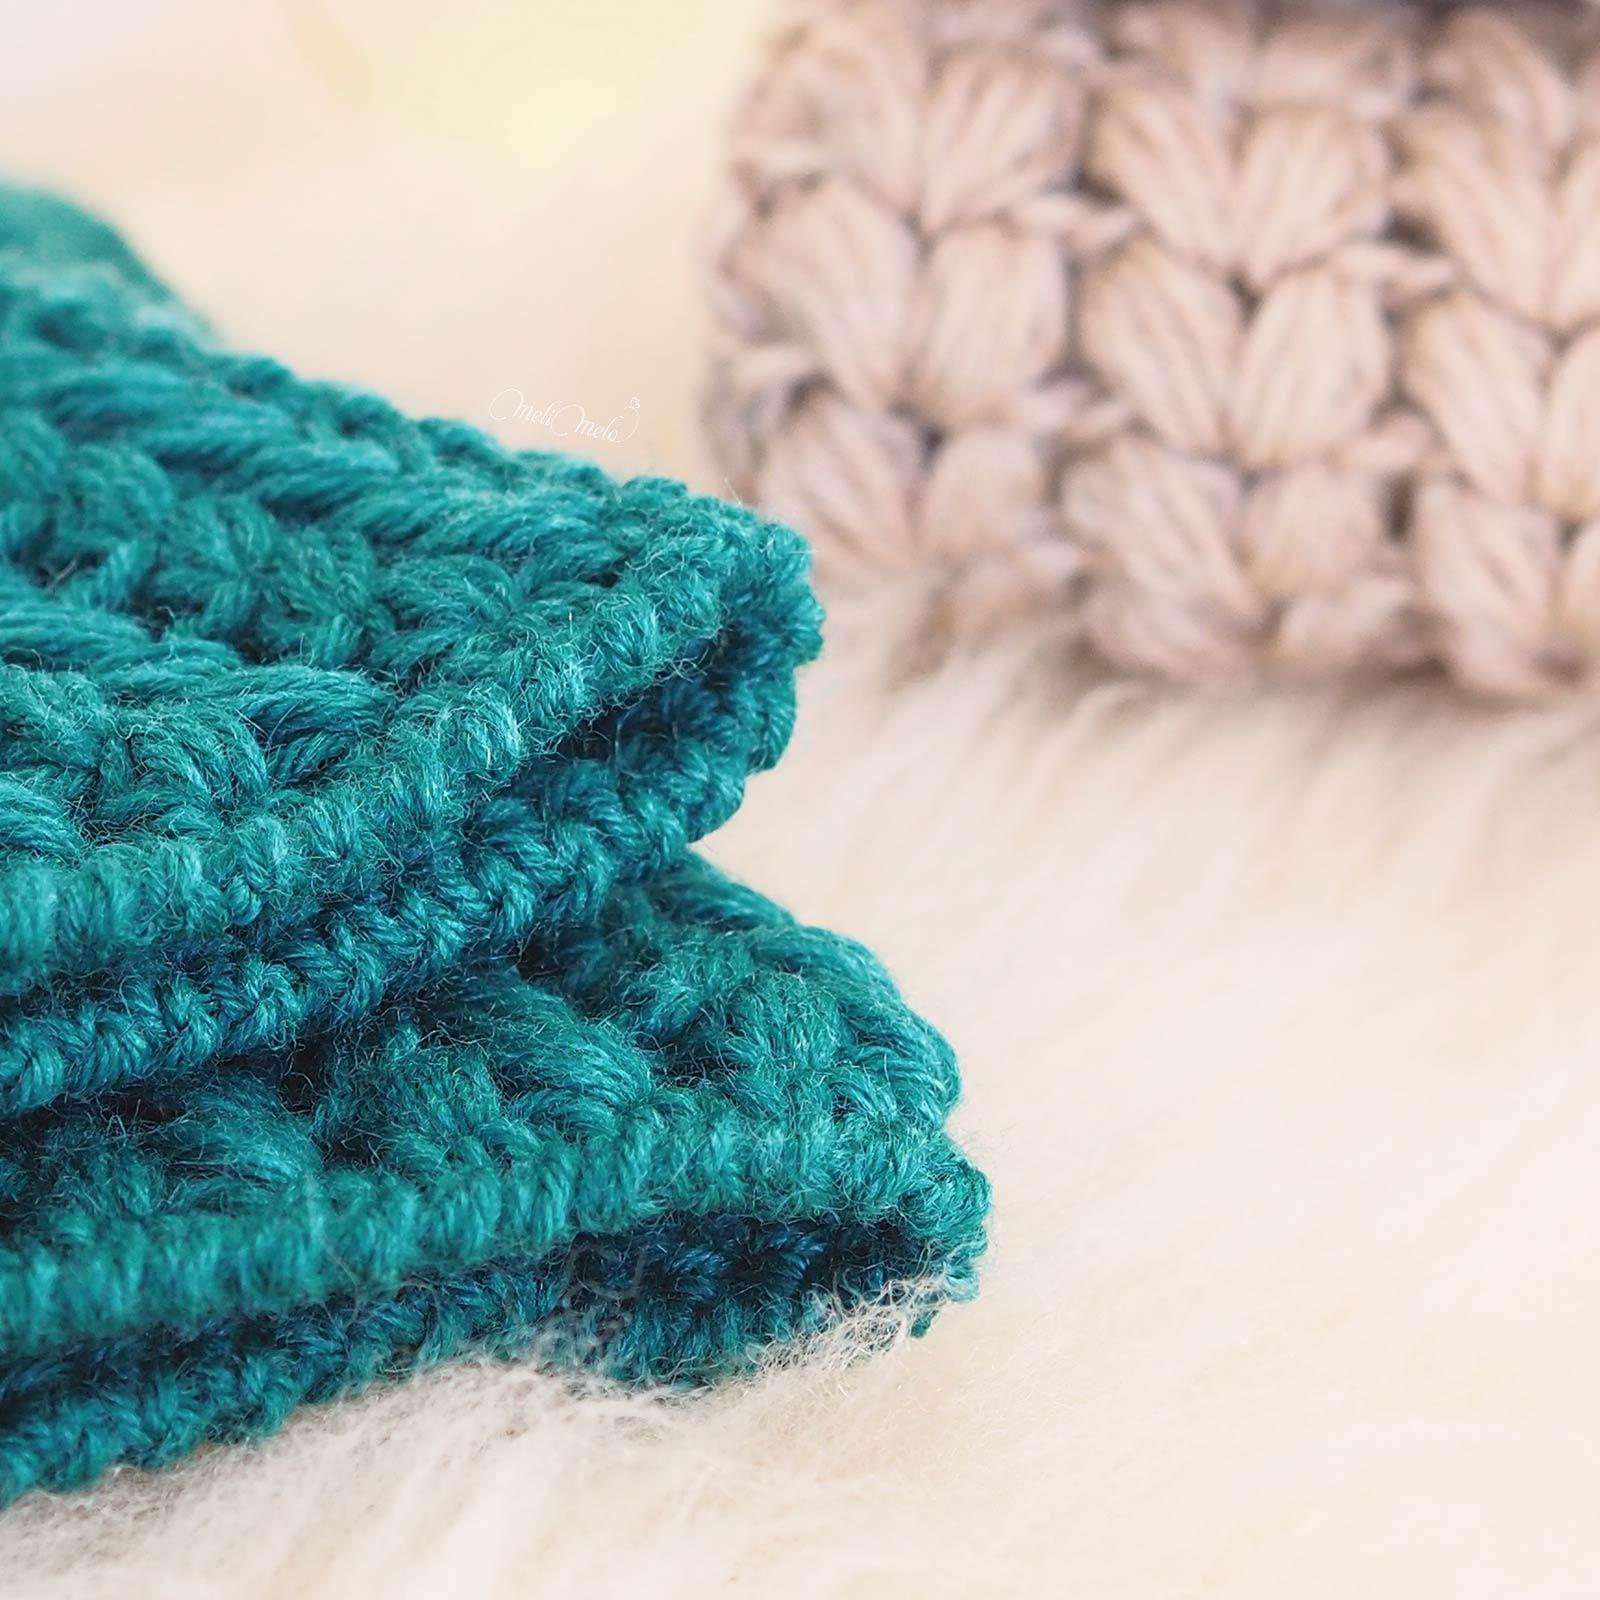 finition-point-ecrevisse-crochet-mitaines-laine-baby-merino-silk-rowan-noel-laboutiquedemelimelo